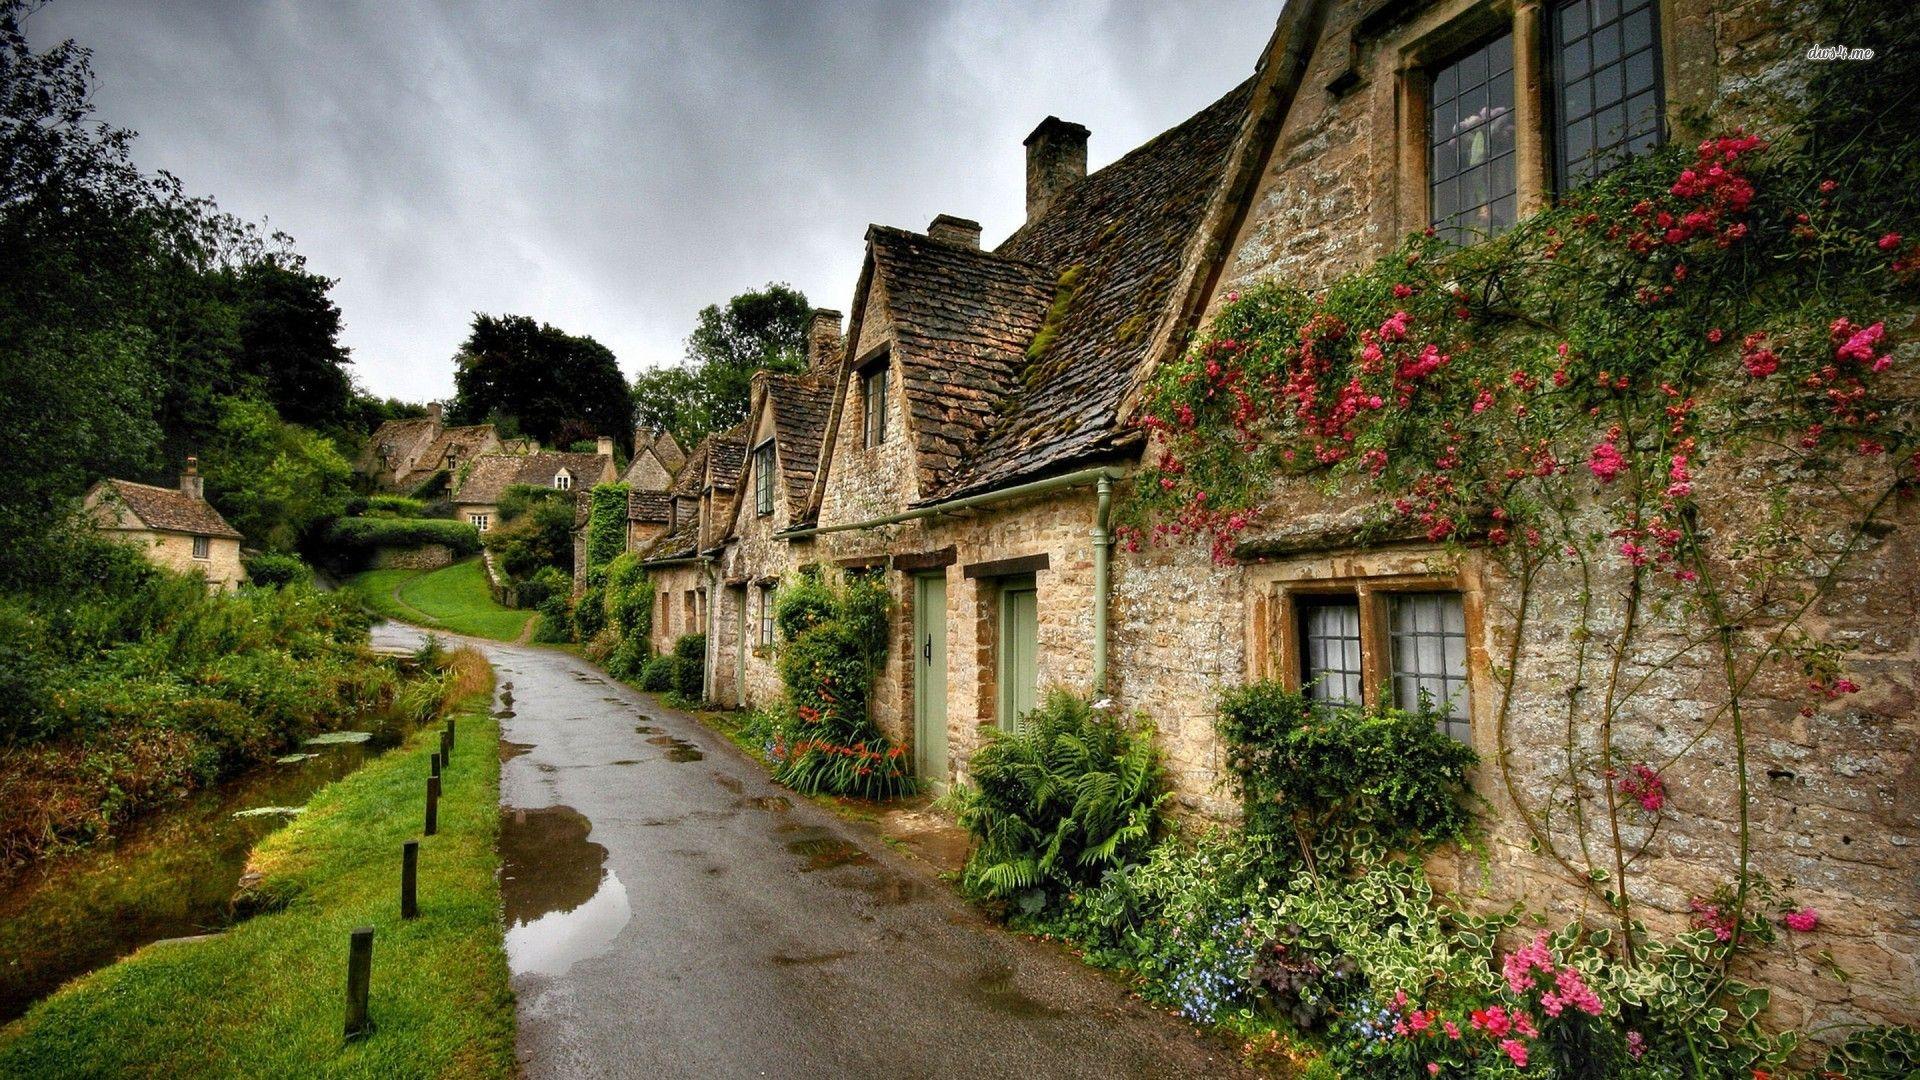 Beautiful Village Street After The Rain Wallpaper Mixhd